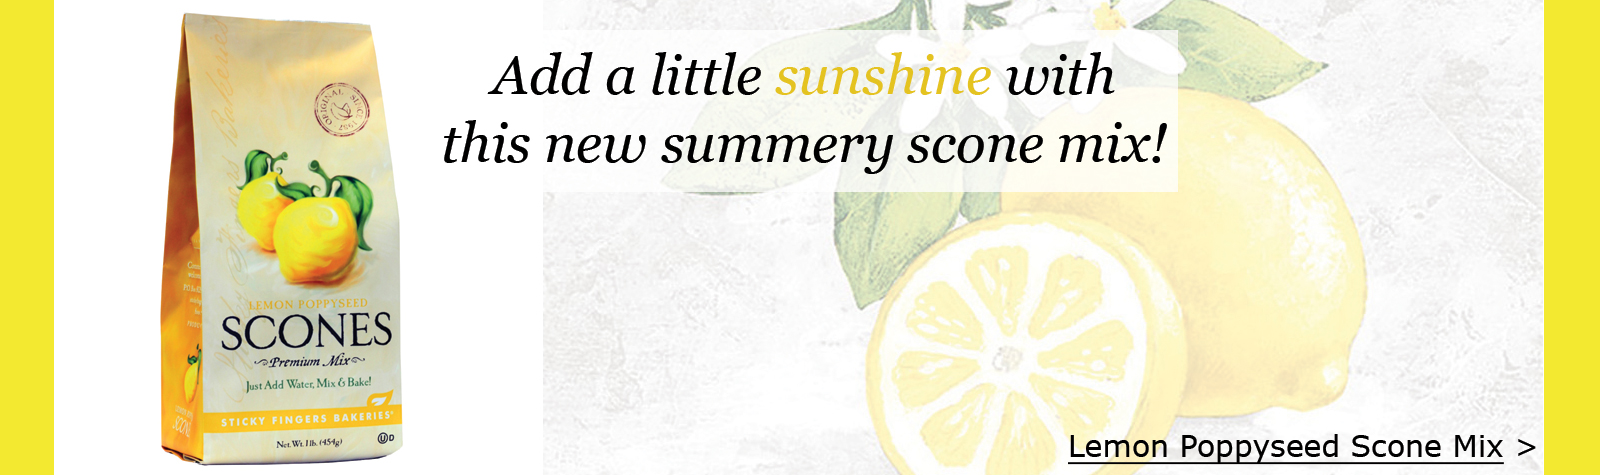 Lemon Scone Mix